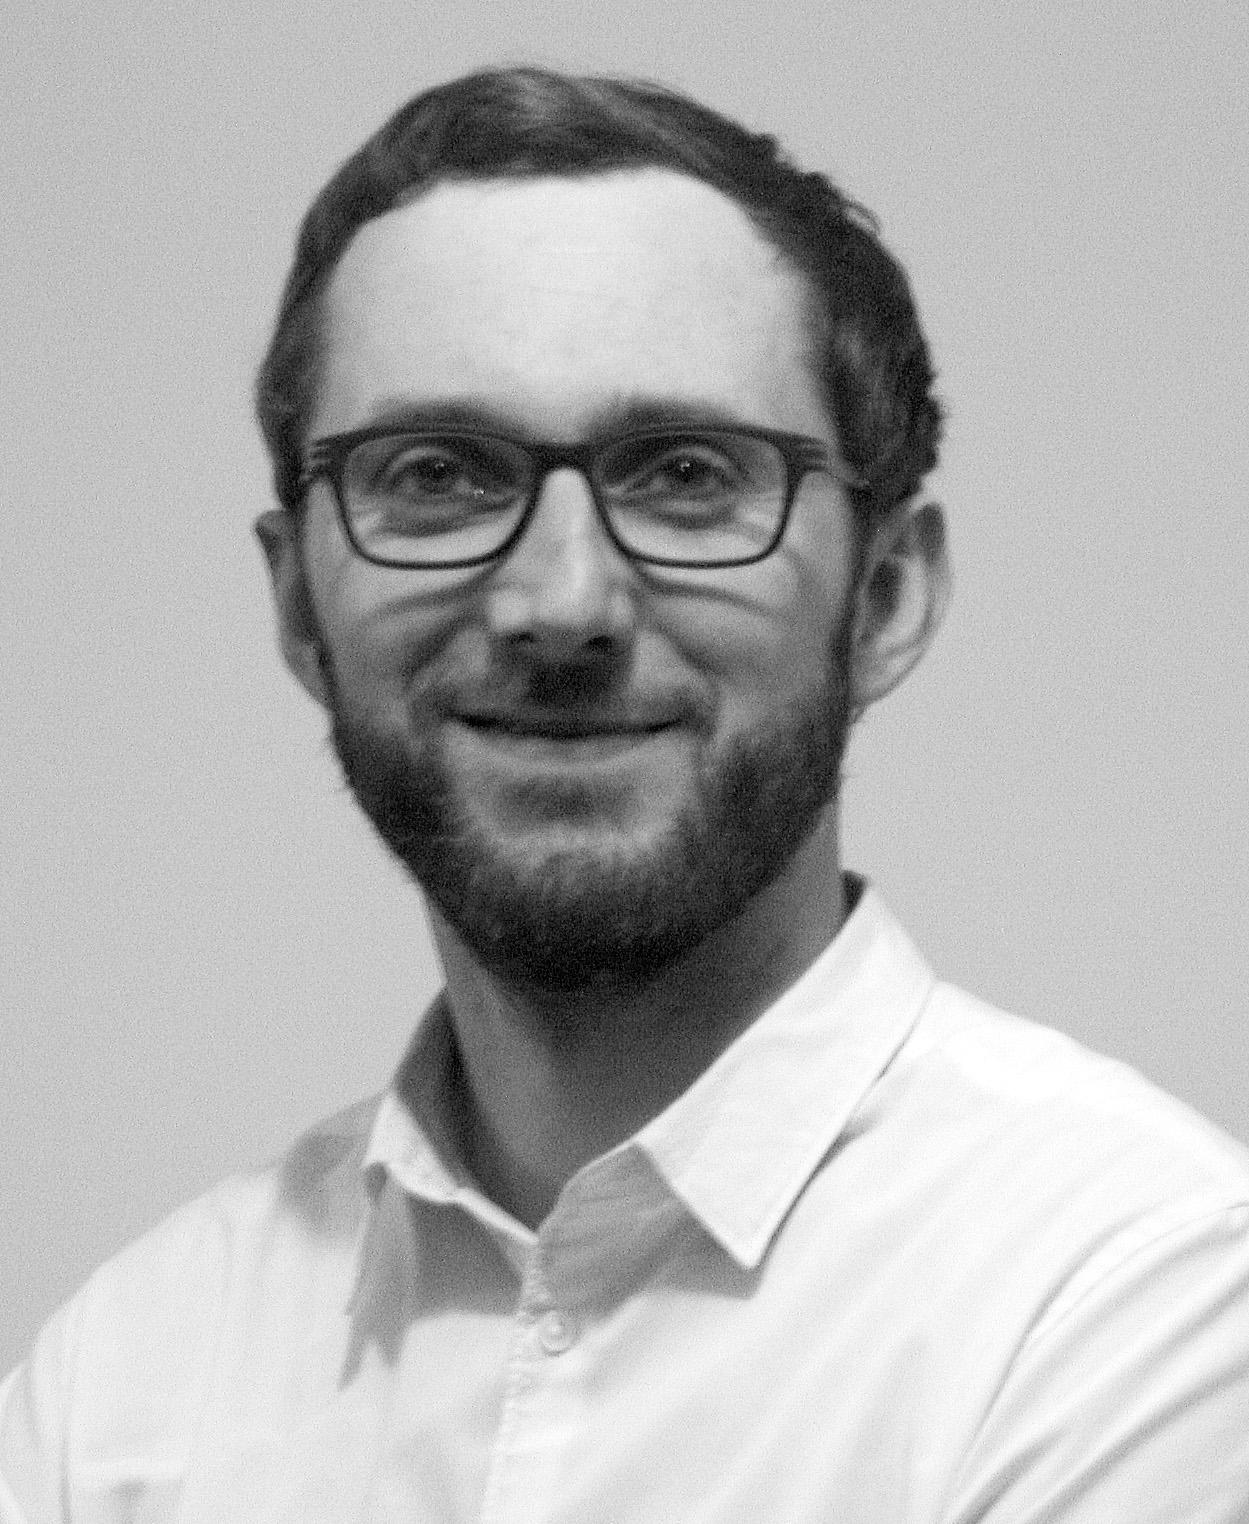 Simon Papin altea